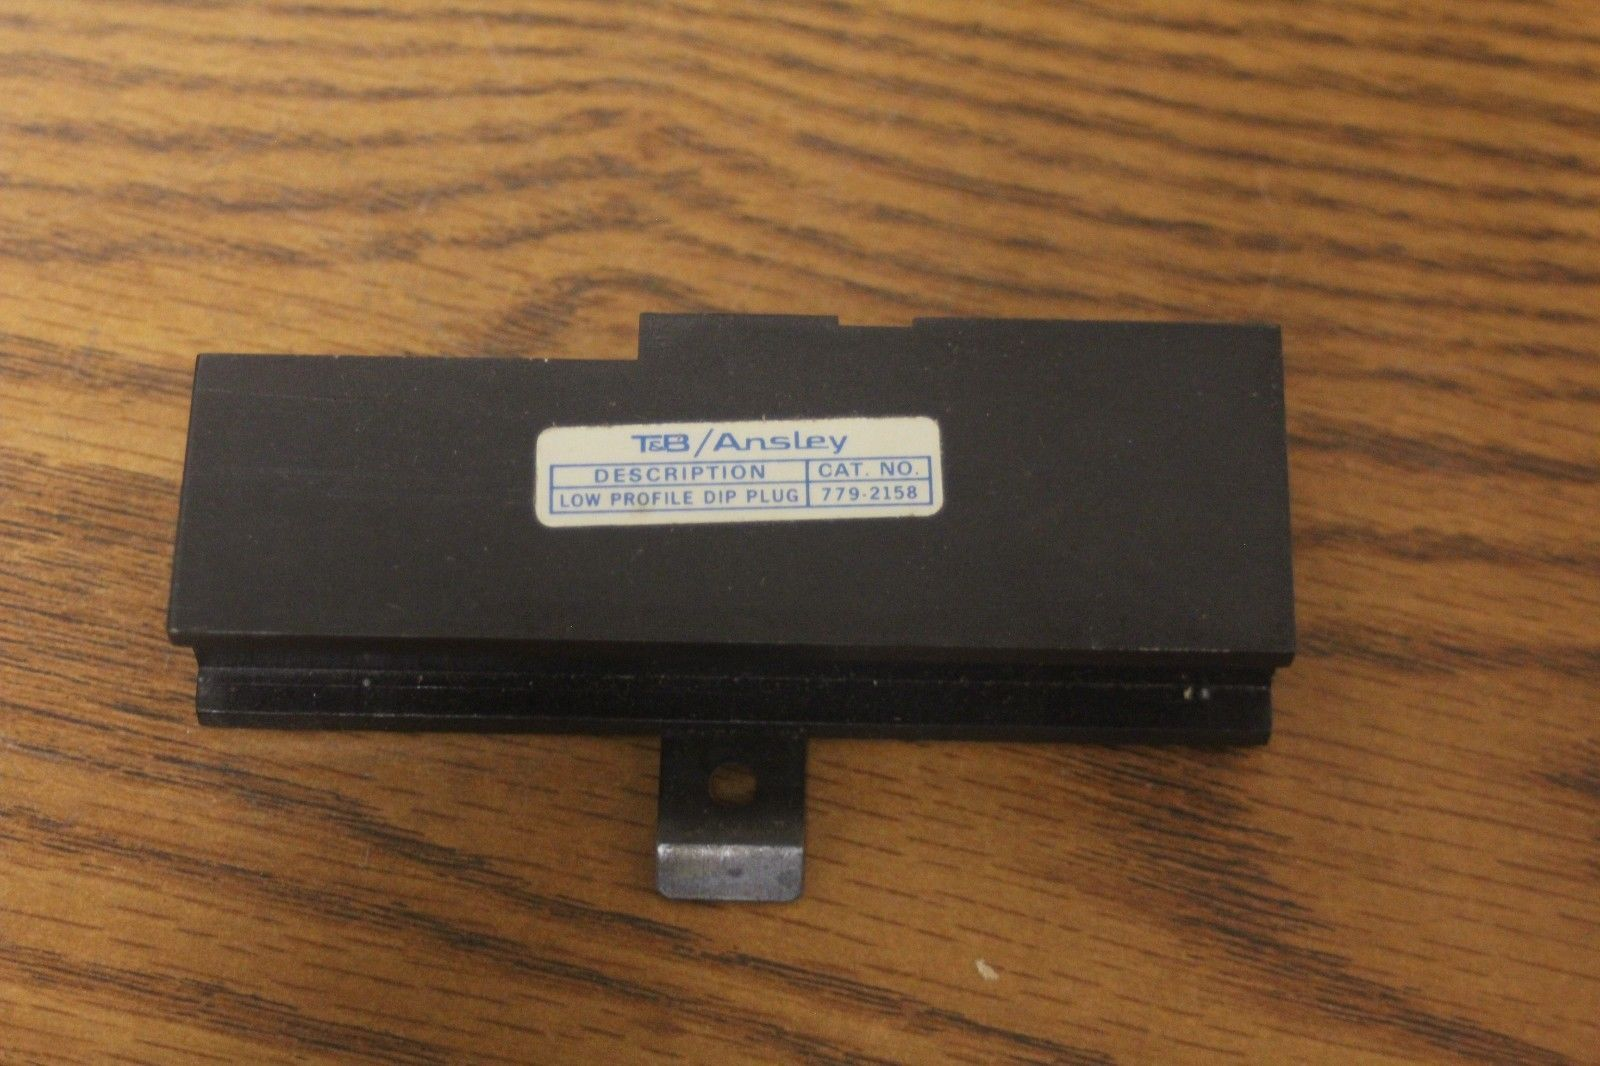 T&B/Ansley 779-2100 Blue Macs Hand Tool W/ 779-2164 /779-2158 Ribbon Connector